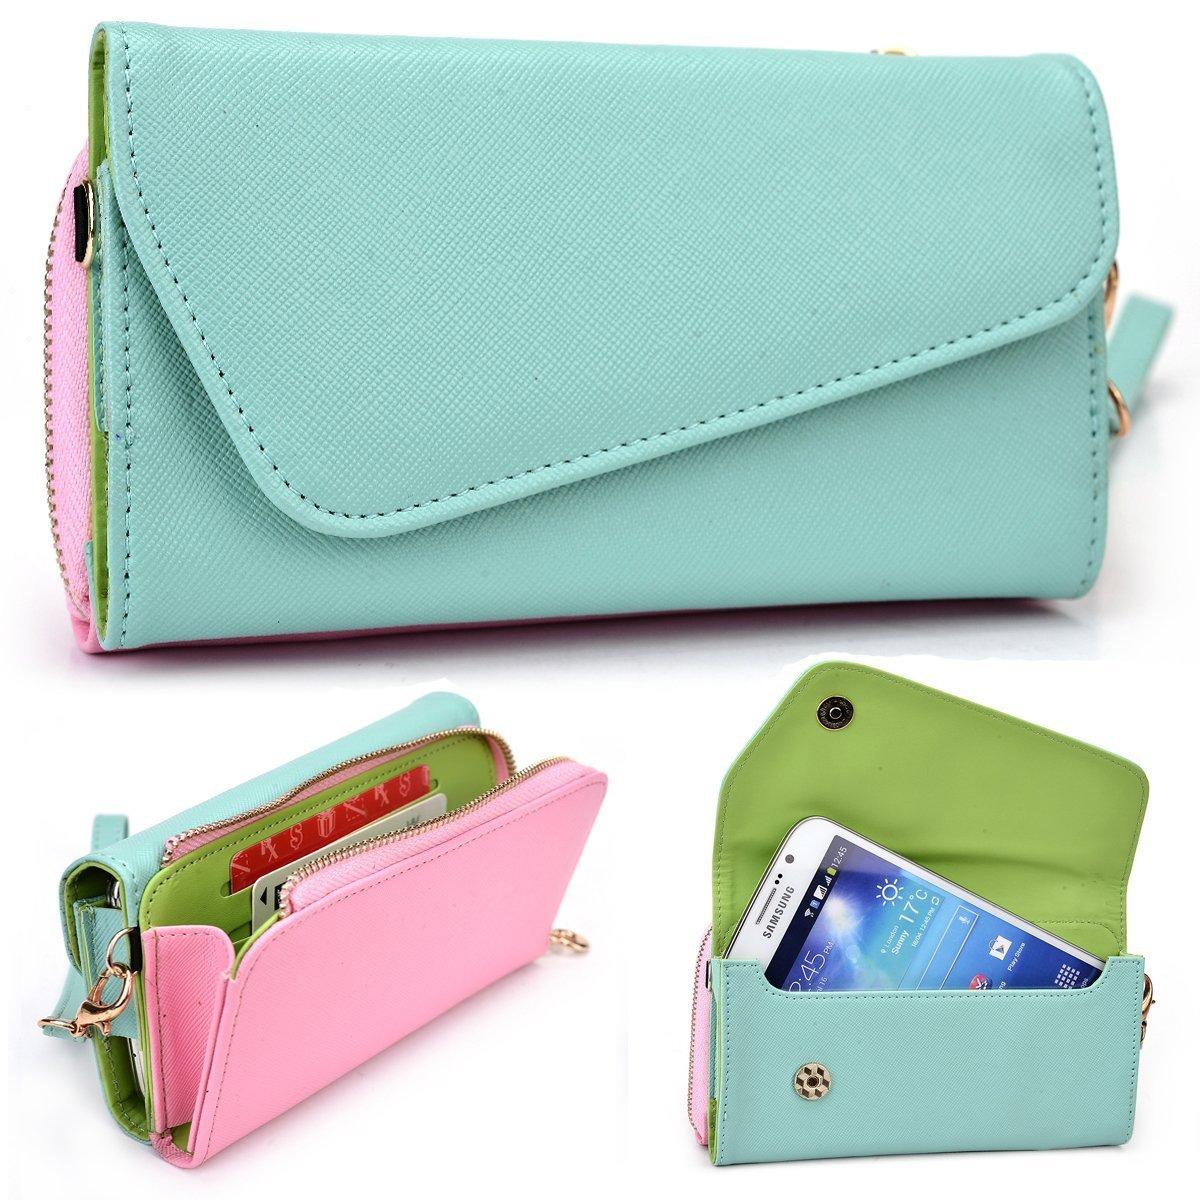 Mint and Pink Crossbody Case for LG G4 Pro, Flex, G Pro 2 D830 D838 F350K F350L F350S Smartphone Phablet